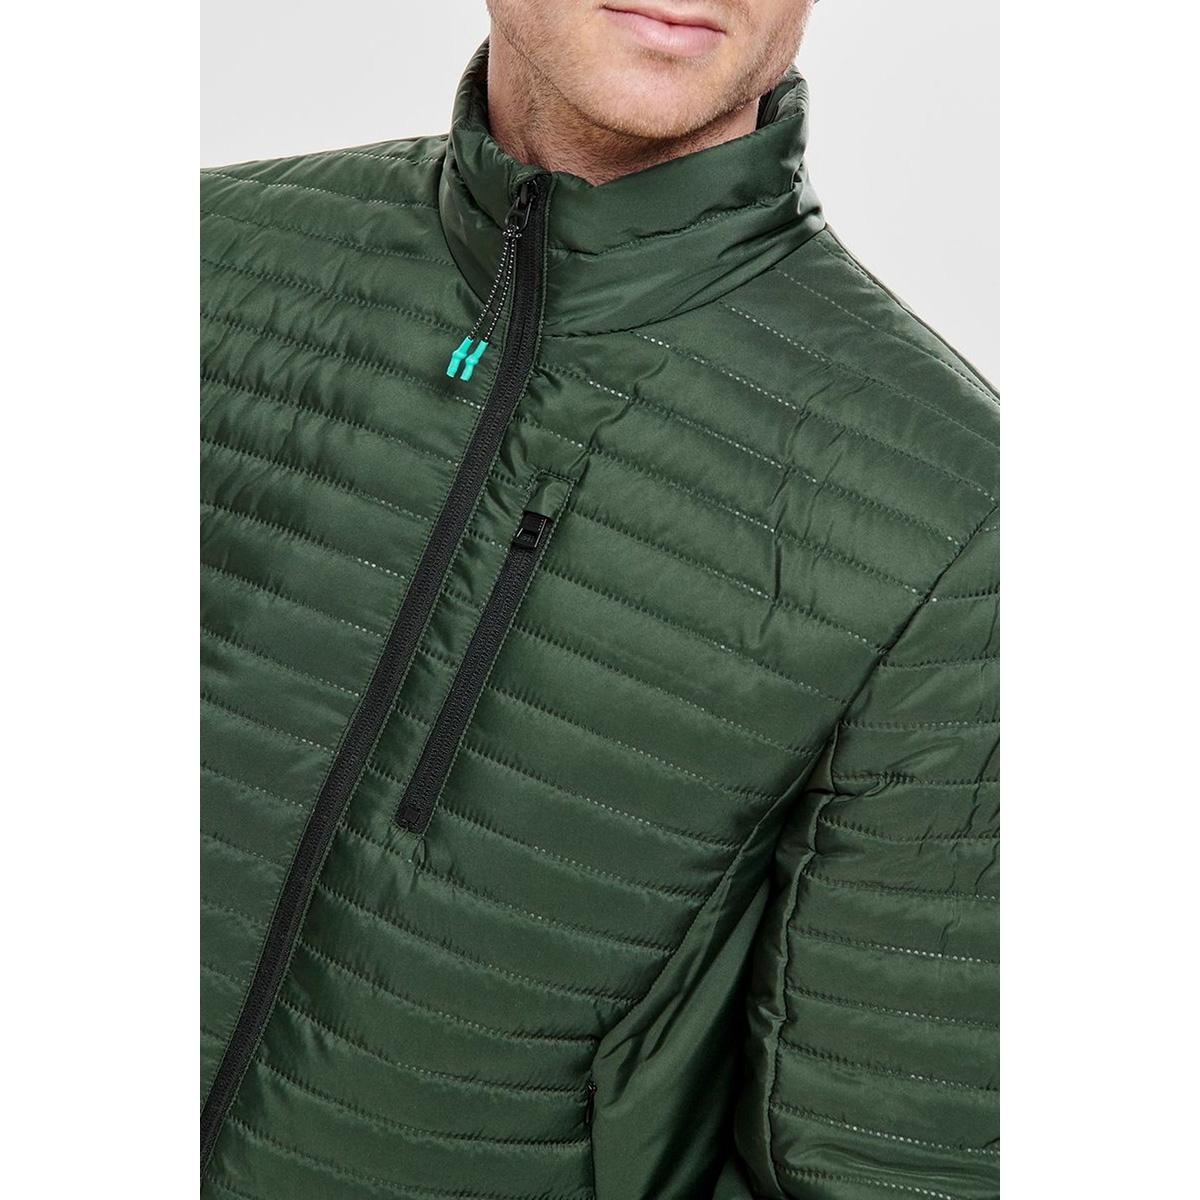 onsanton highneck jacket otw 22011946 only & sons jas deep forest